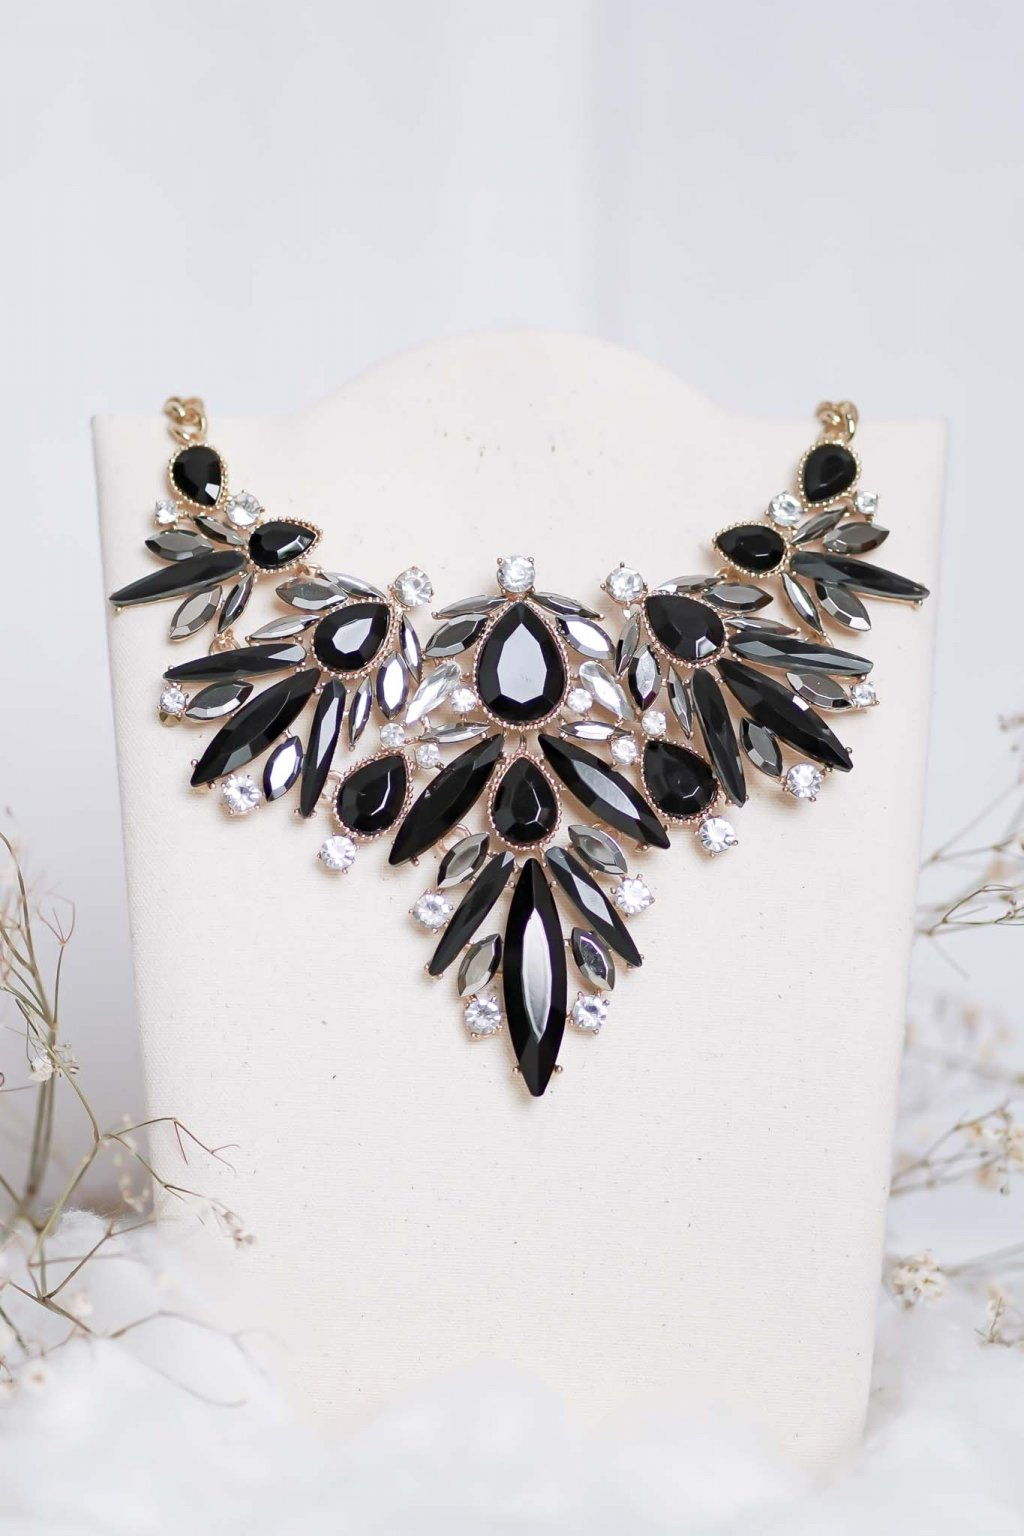 náhrdelník, šperk, spoločenská náhrdelník, náhrdelník na bežný deň, výrazný náhrdelník, jemný náhrdelník, šperky, náhrdelník na ples, svadbu, stužkovú 80